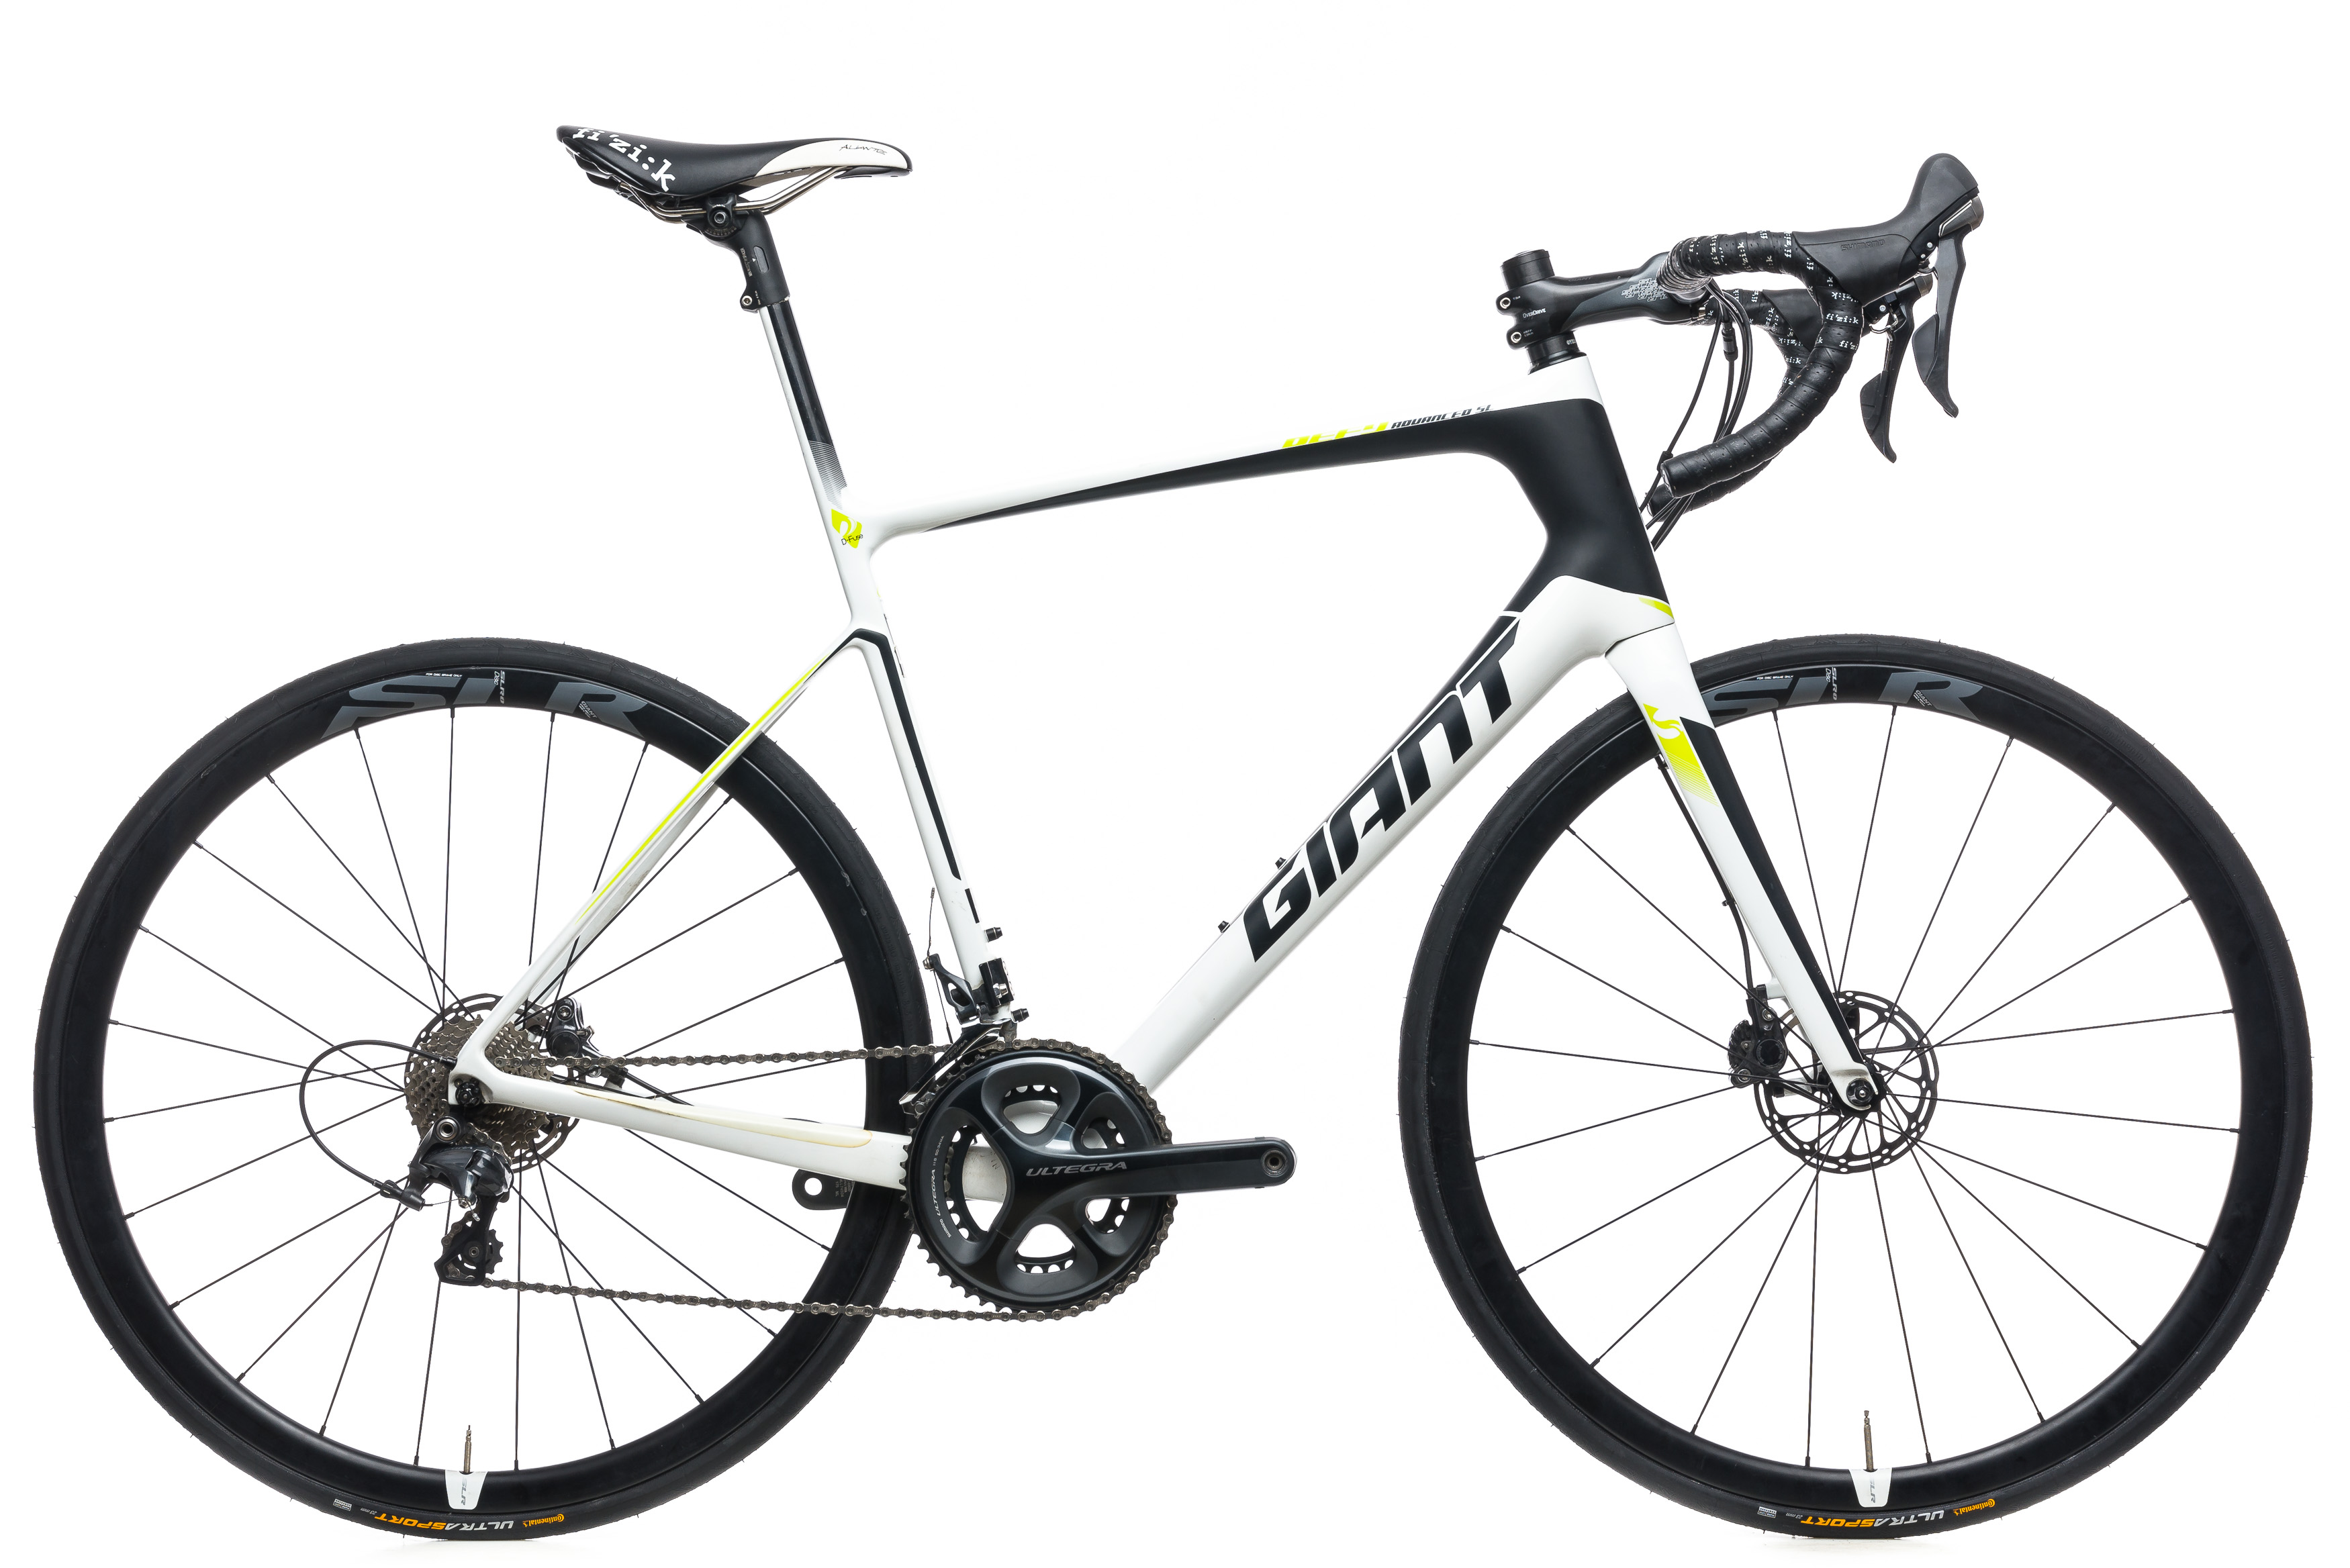 9d2b37c93d8 2015 Giant Defy Advanced SL 1 Road Bike 55.5cm Large Carbon ISP Shimano  Ultegra